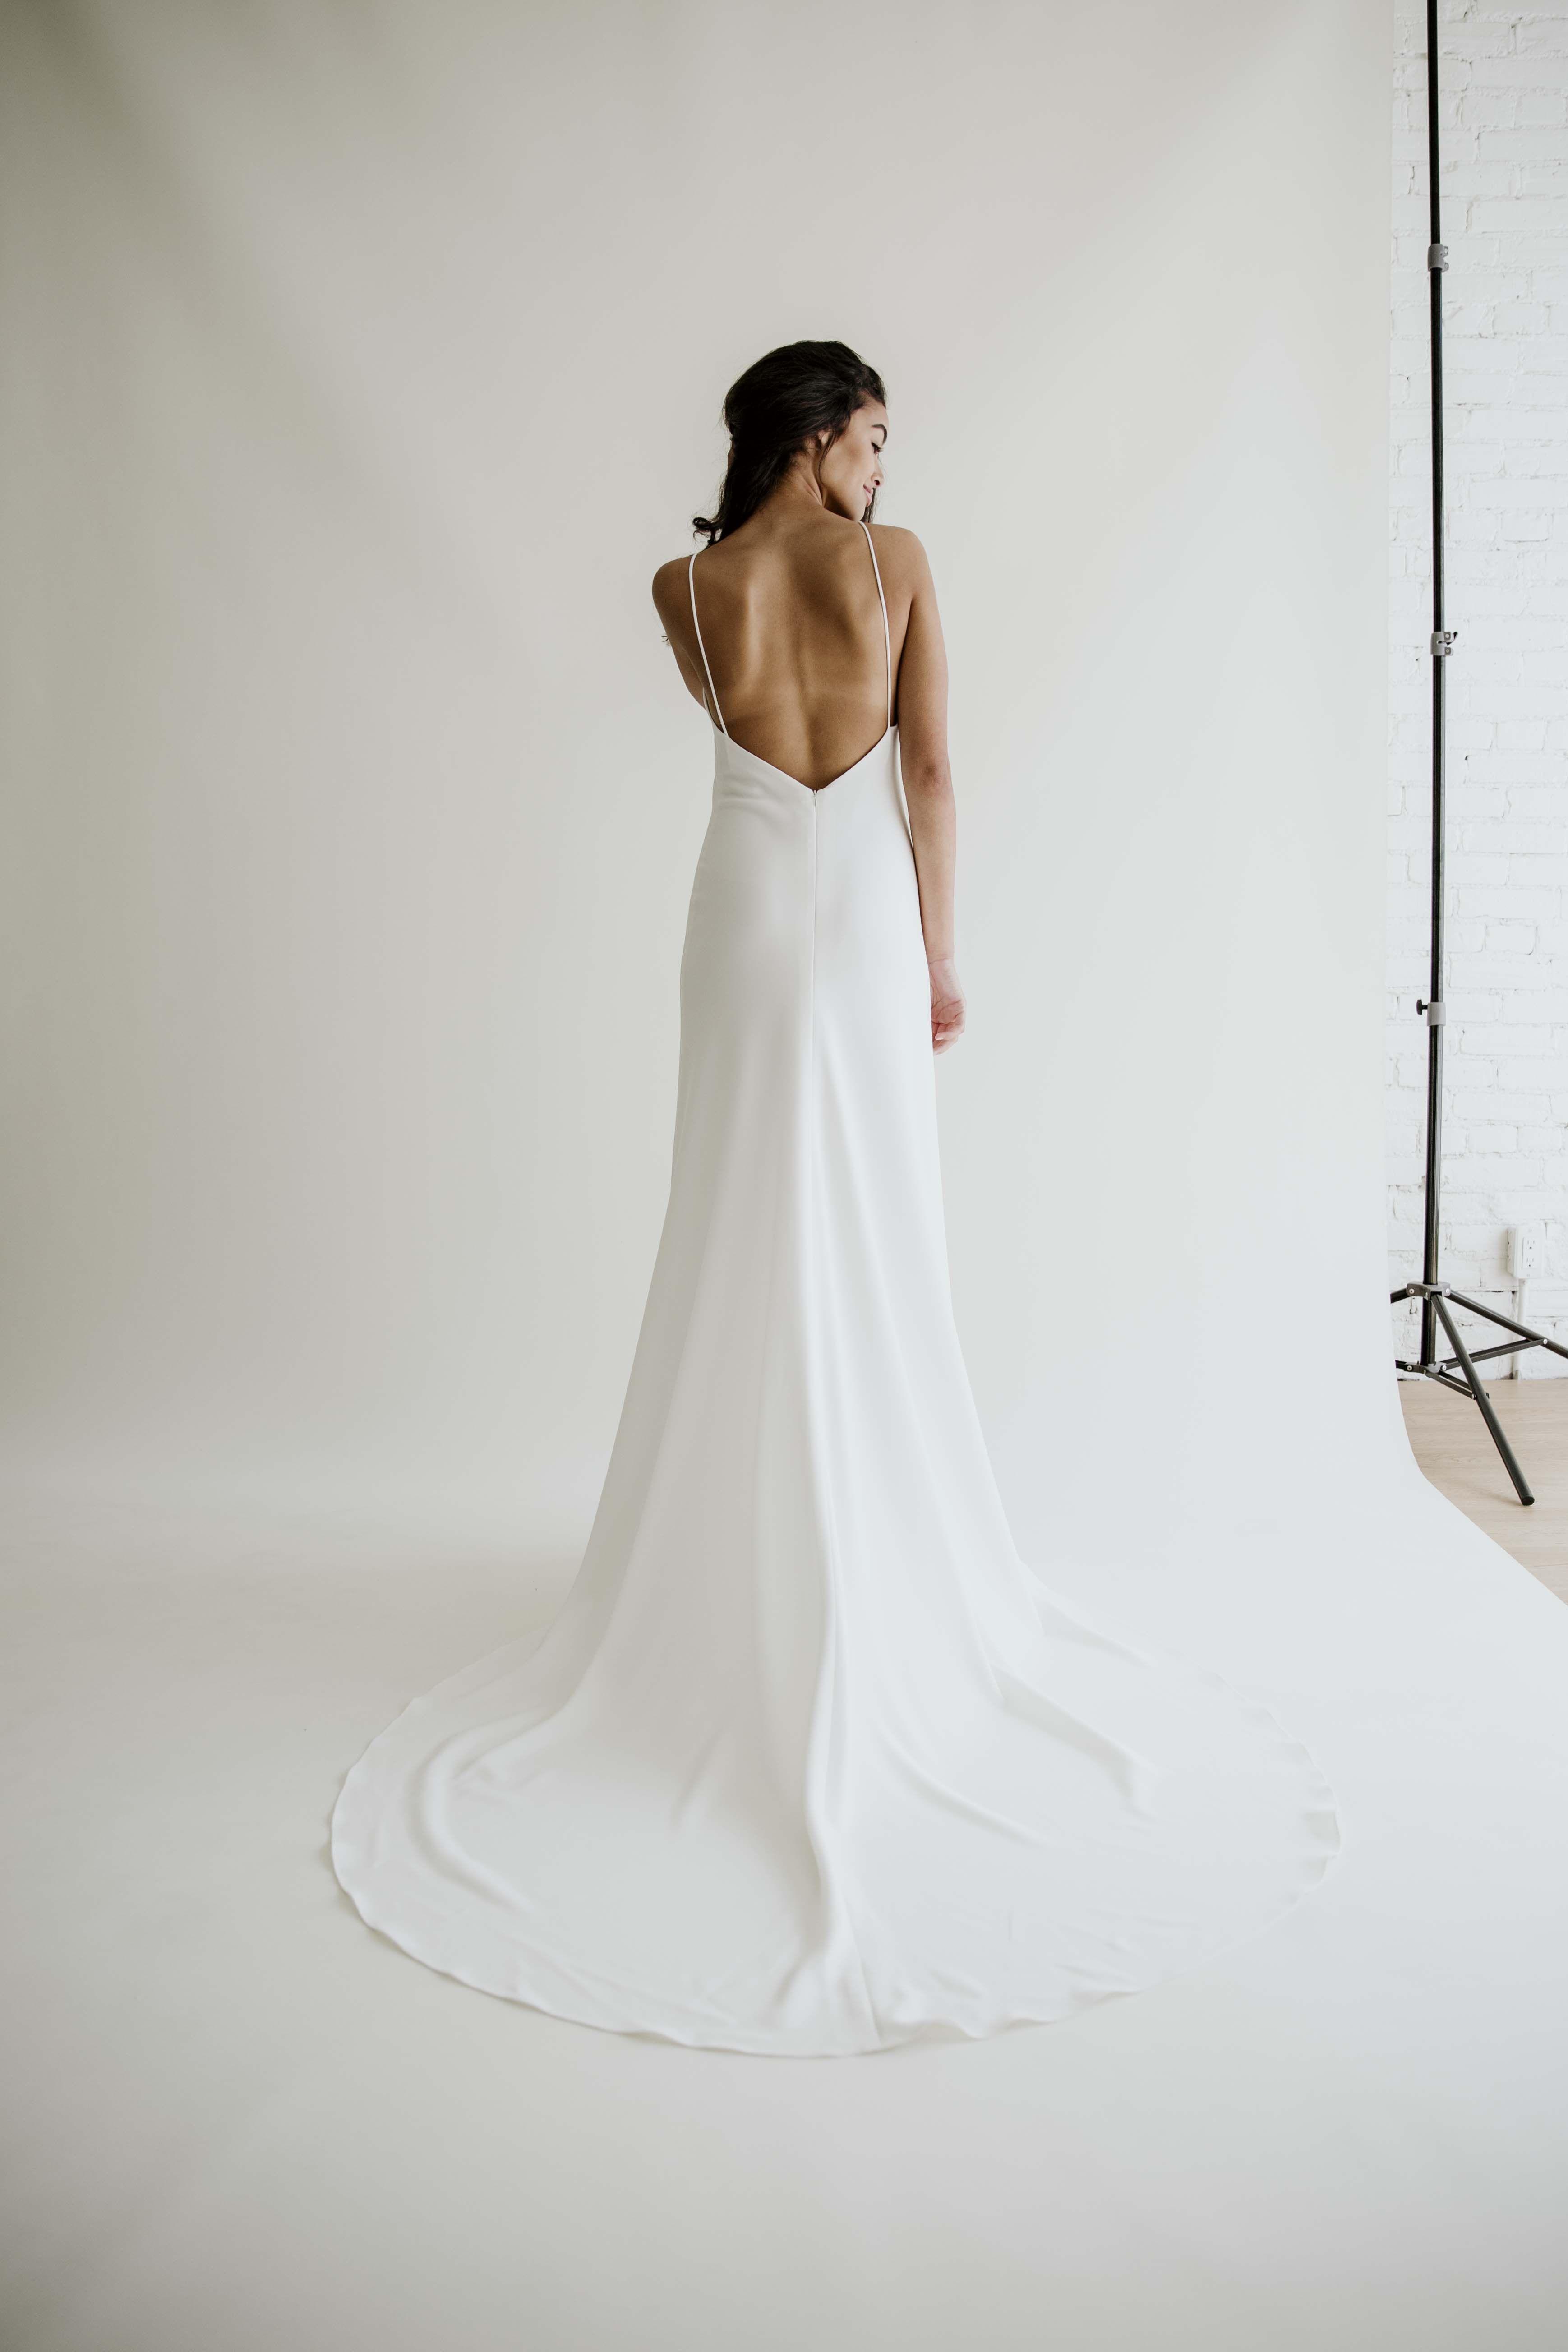 Ingrid By Anais Anette 2019 Wedding Dresses Modern Wedding Dresses Fitted Crepe Wedding Minimalist Wedding Dresses Wedding Dresses Wedding Dress Low Back [ 5214 x 3476 Pixel ]